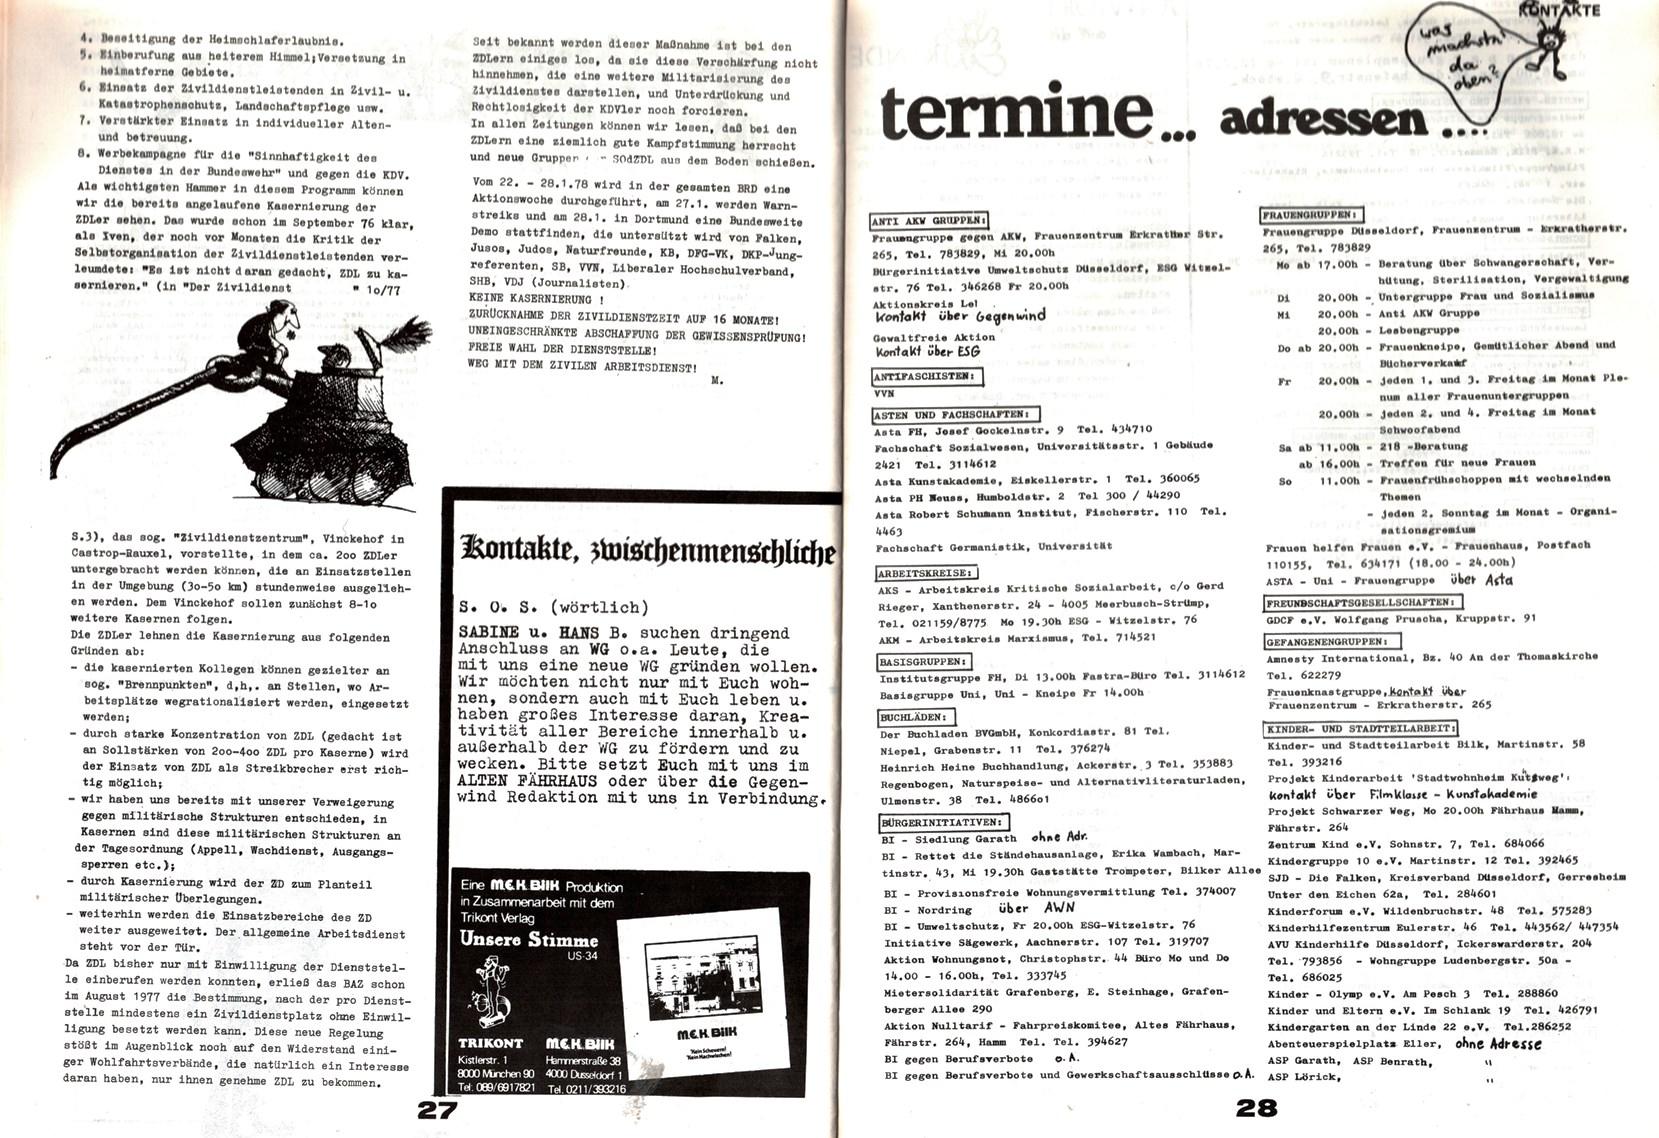 Duesseldorf_Gegenwind_19780200_015